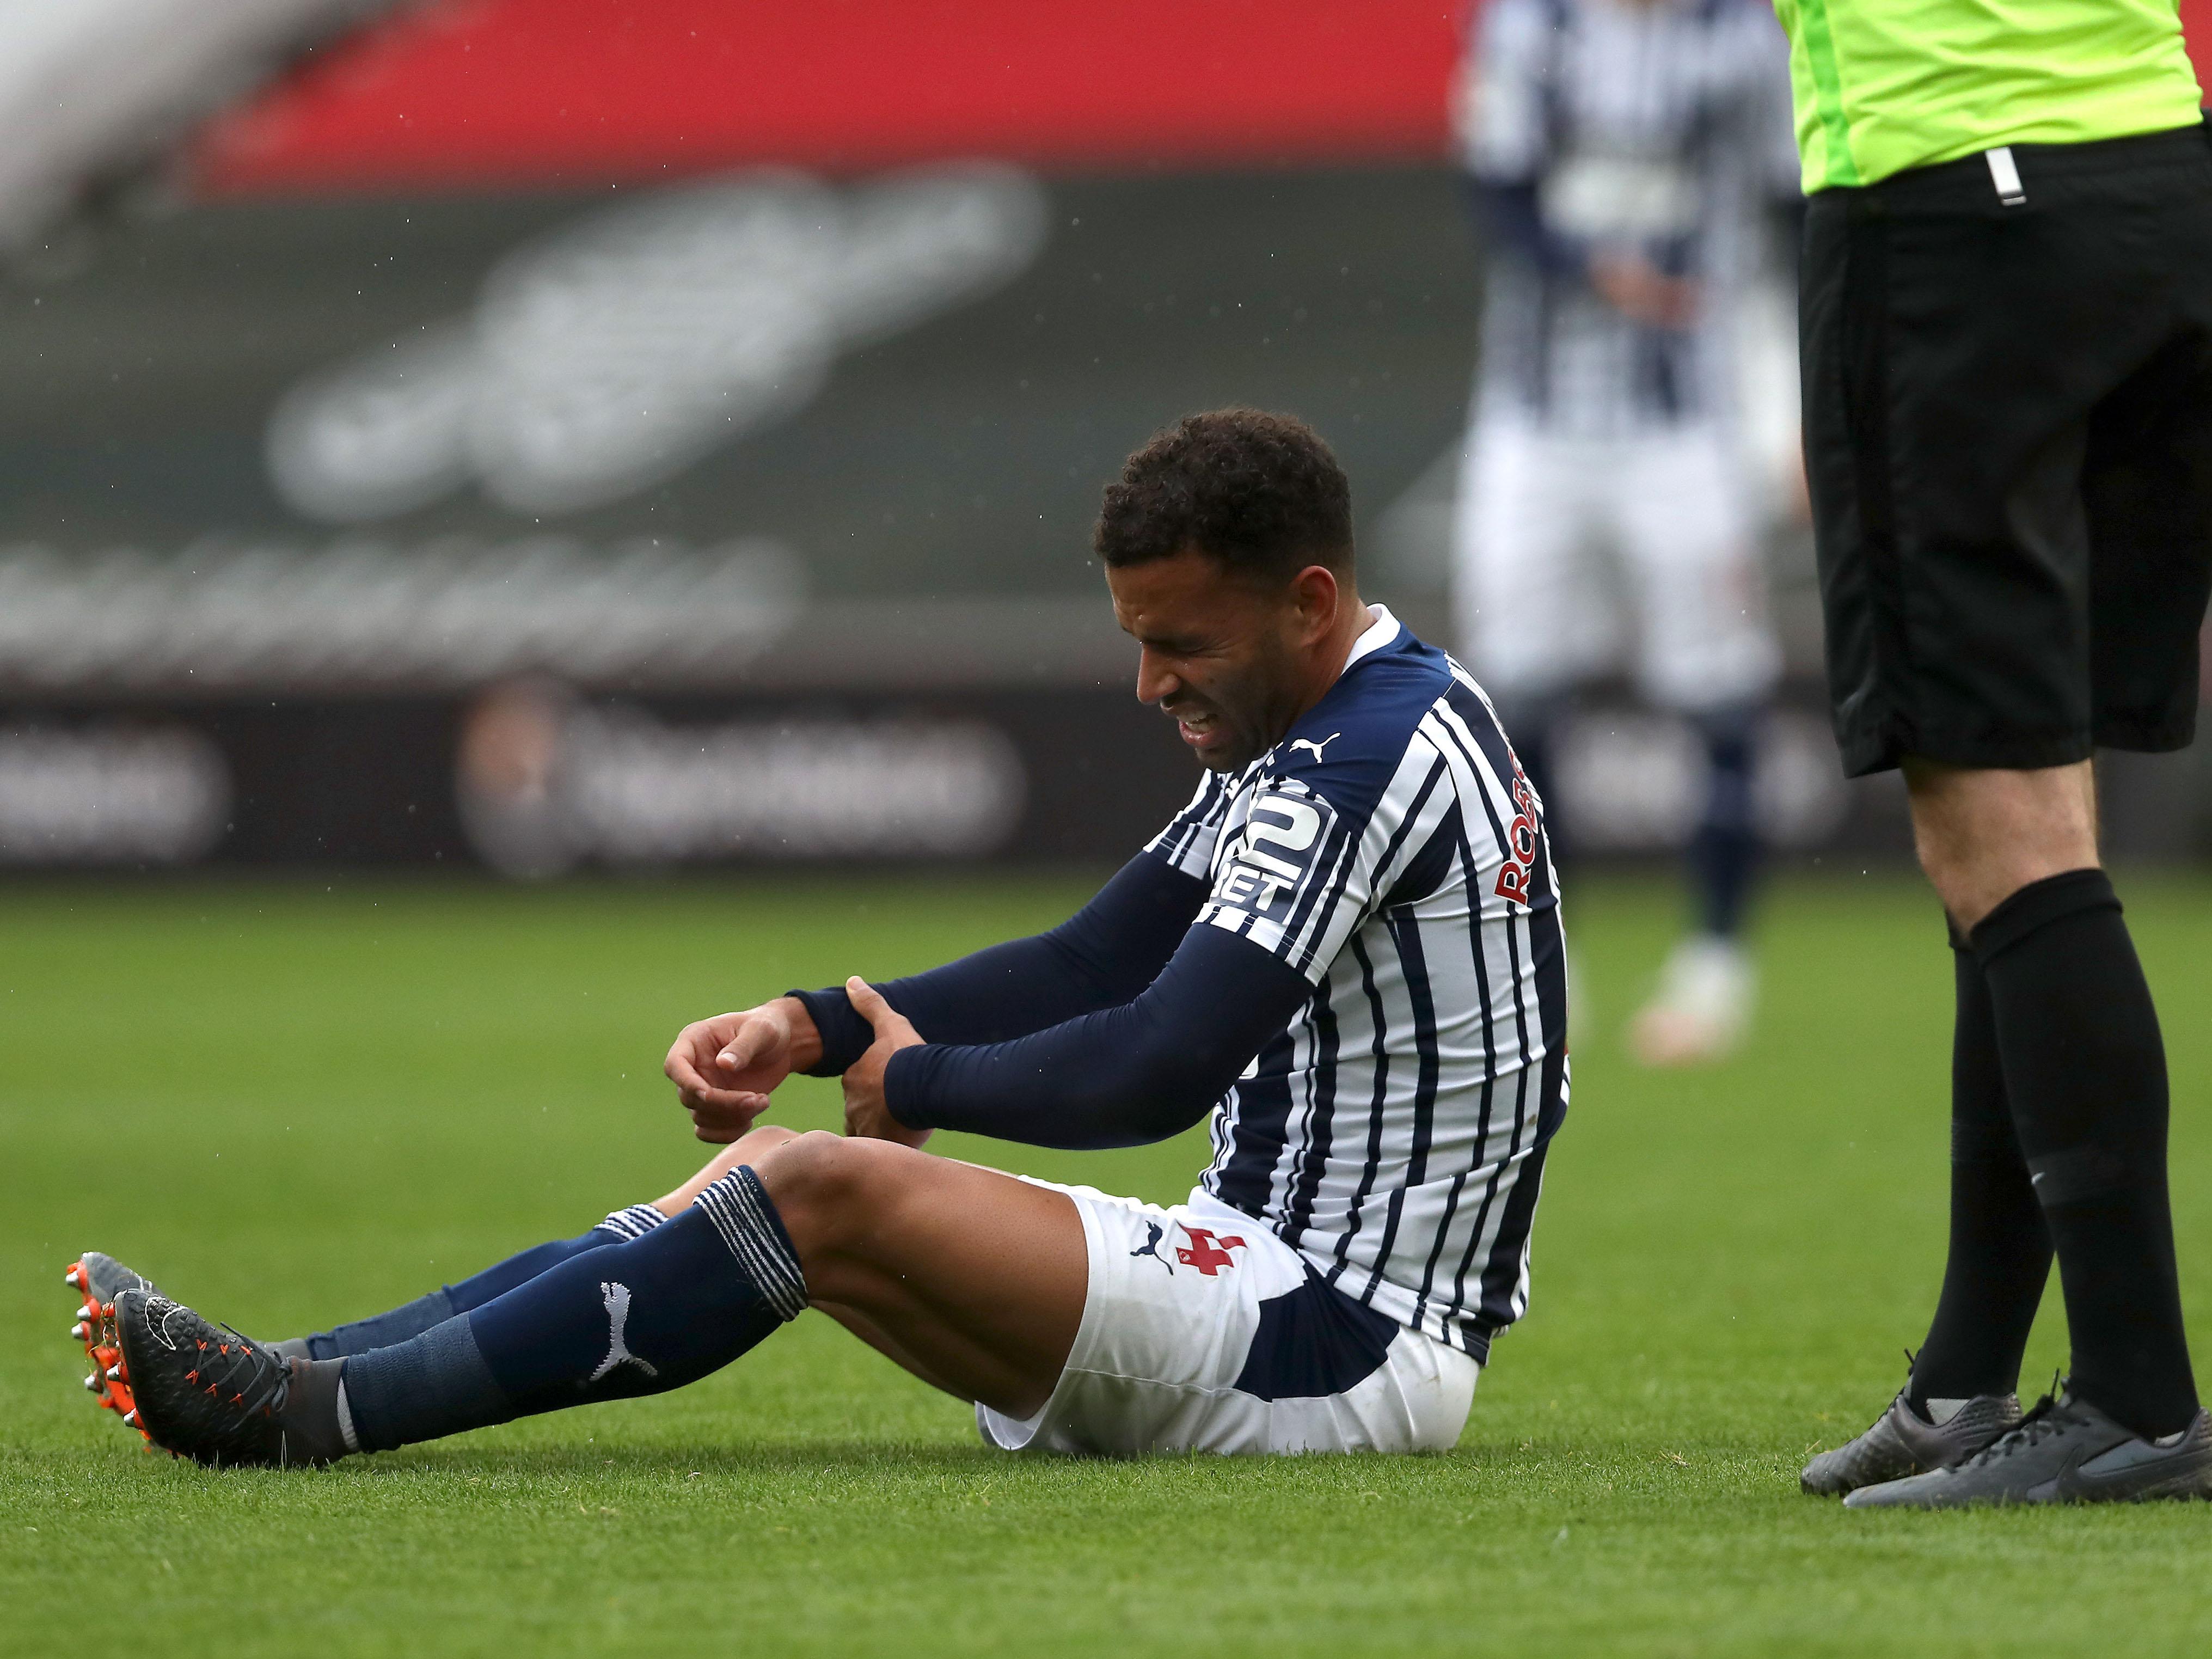 Robson-Kanu suffers broken arm injury